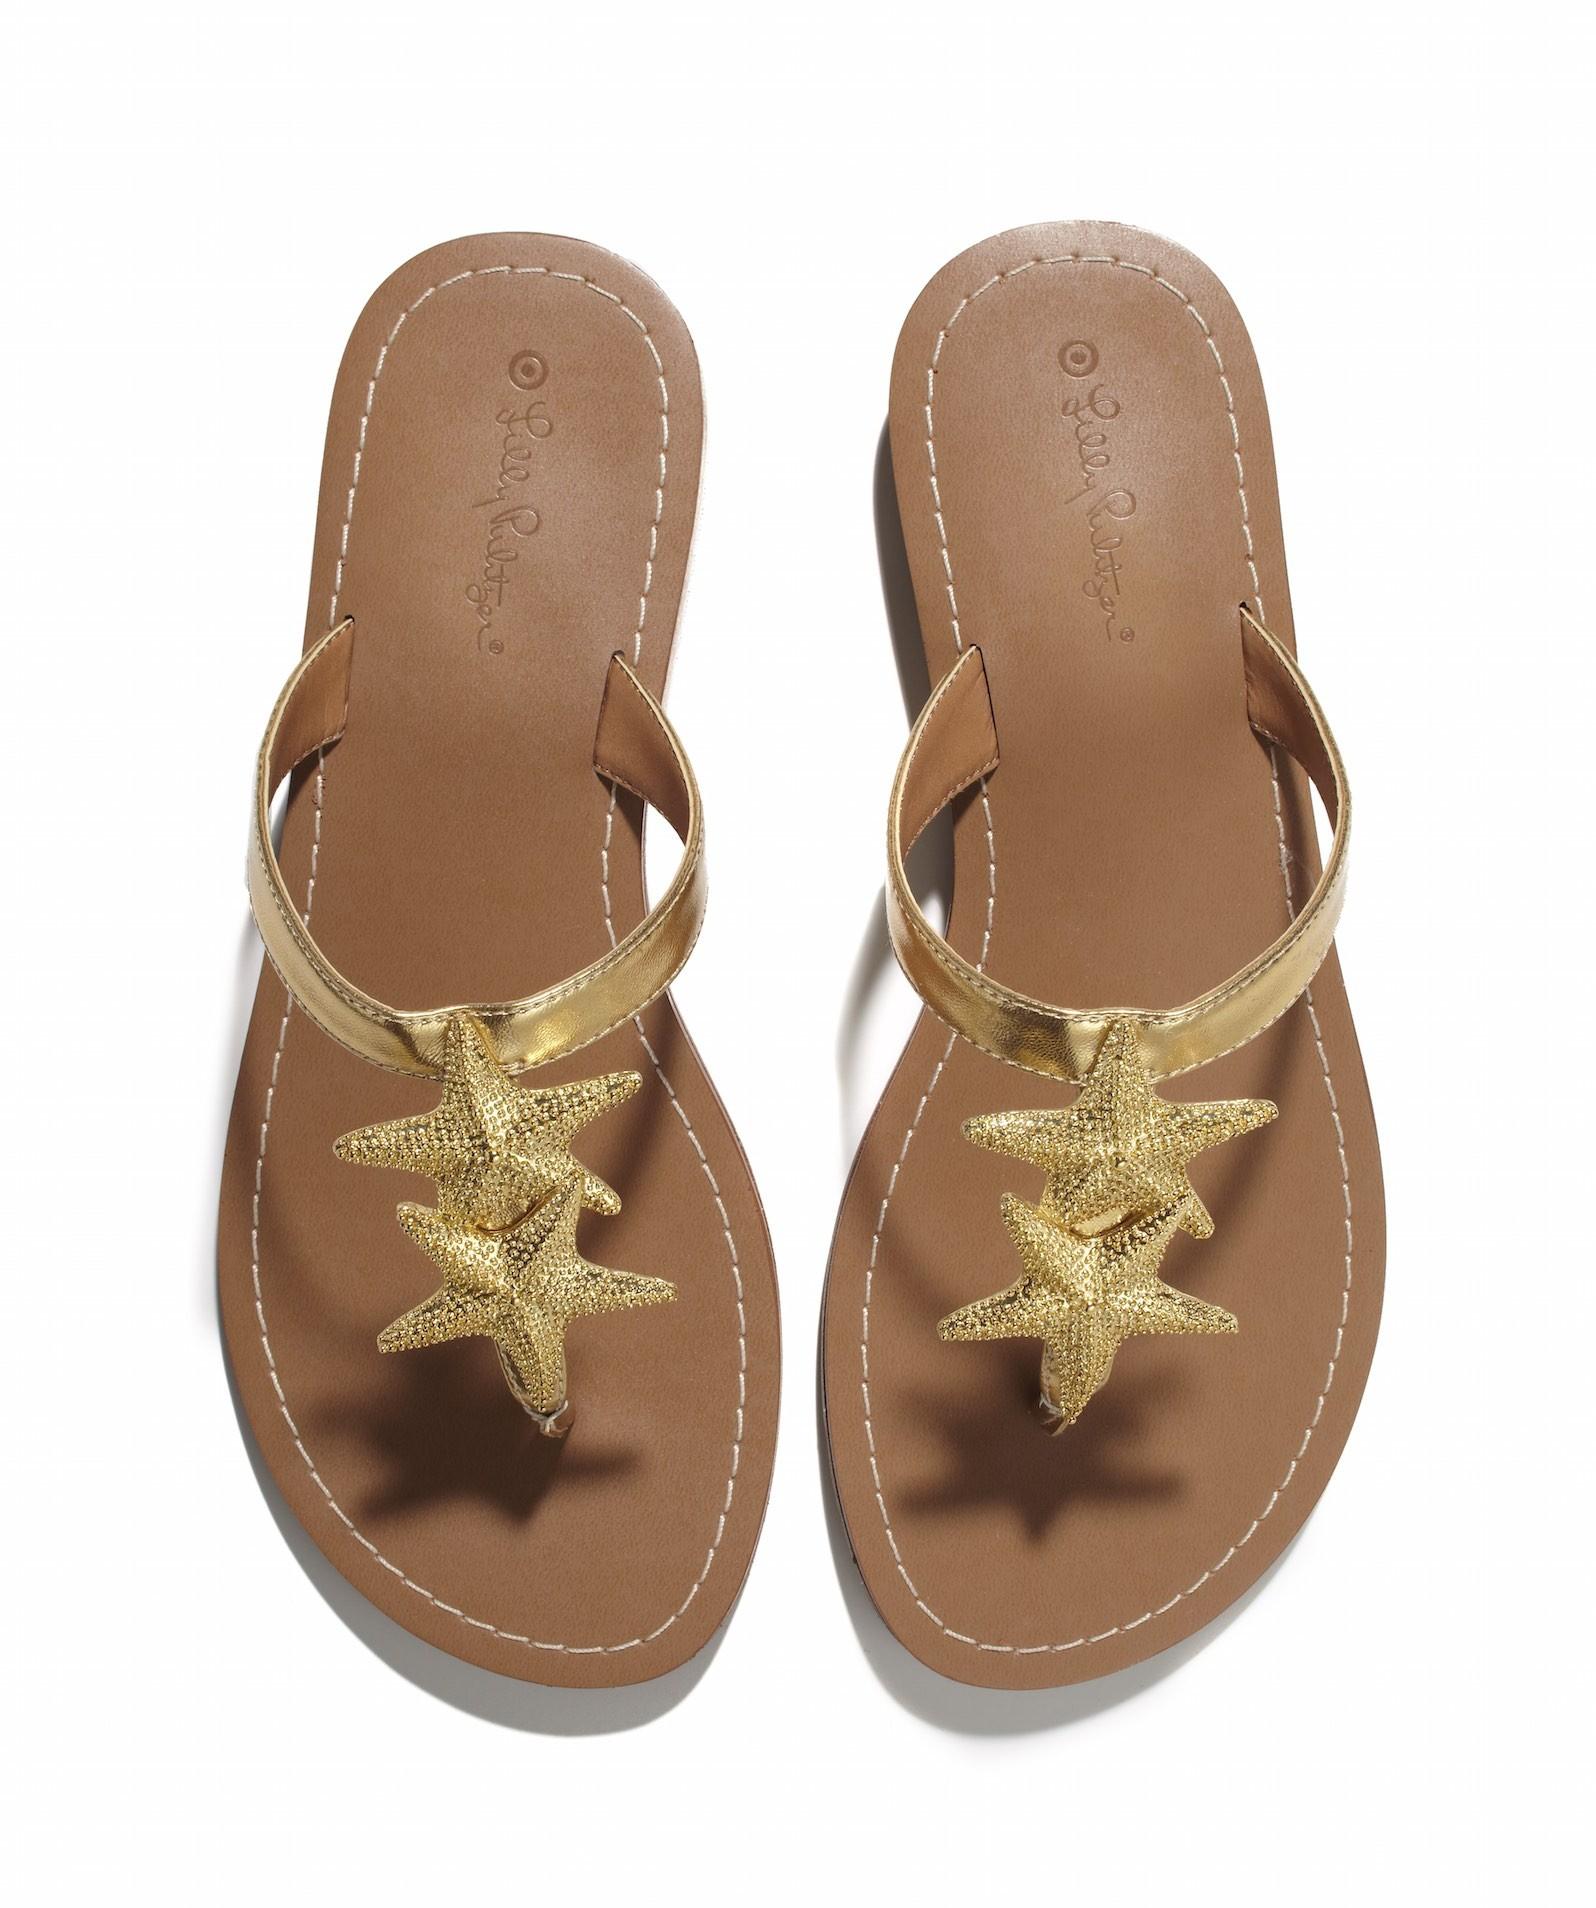 starfish-sandals-gold